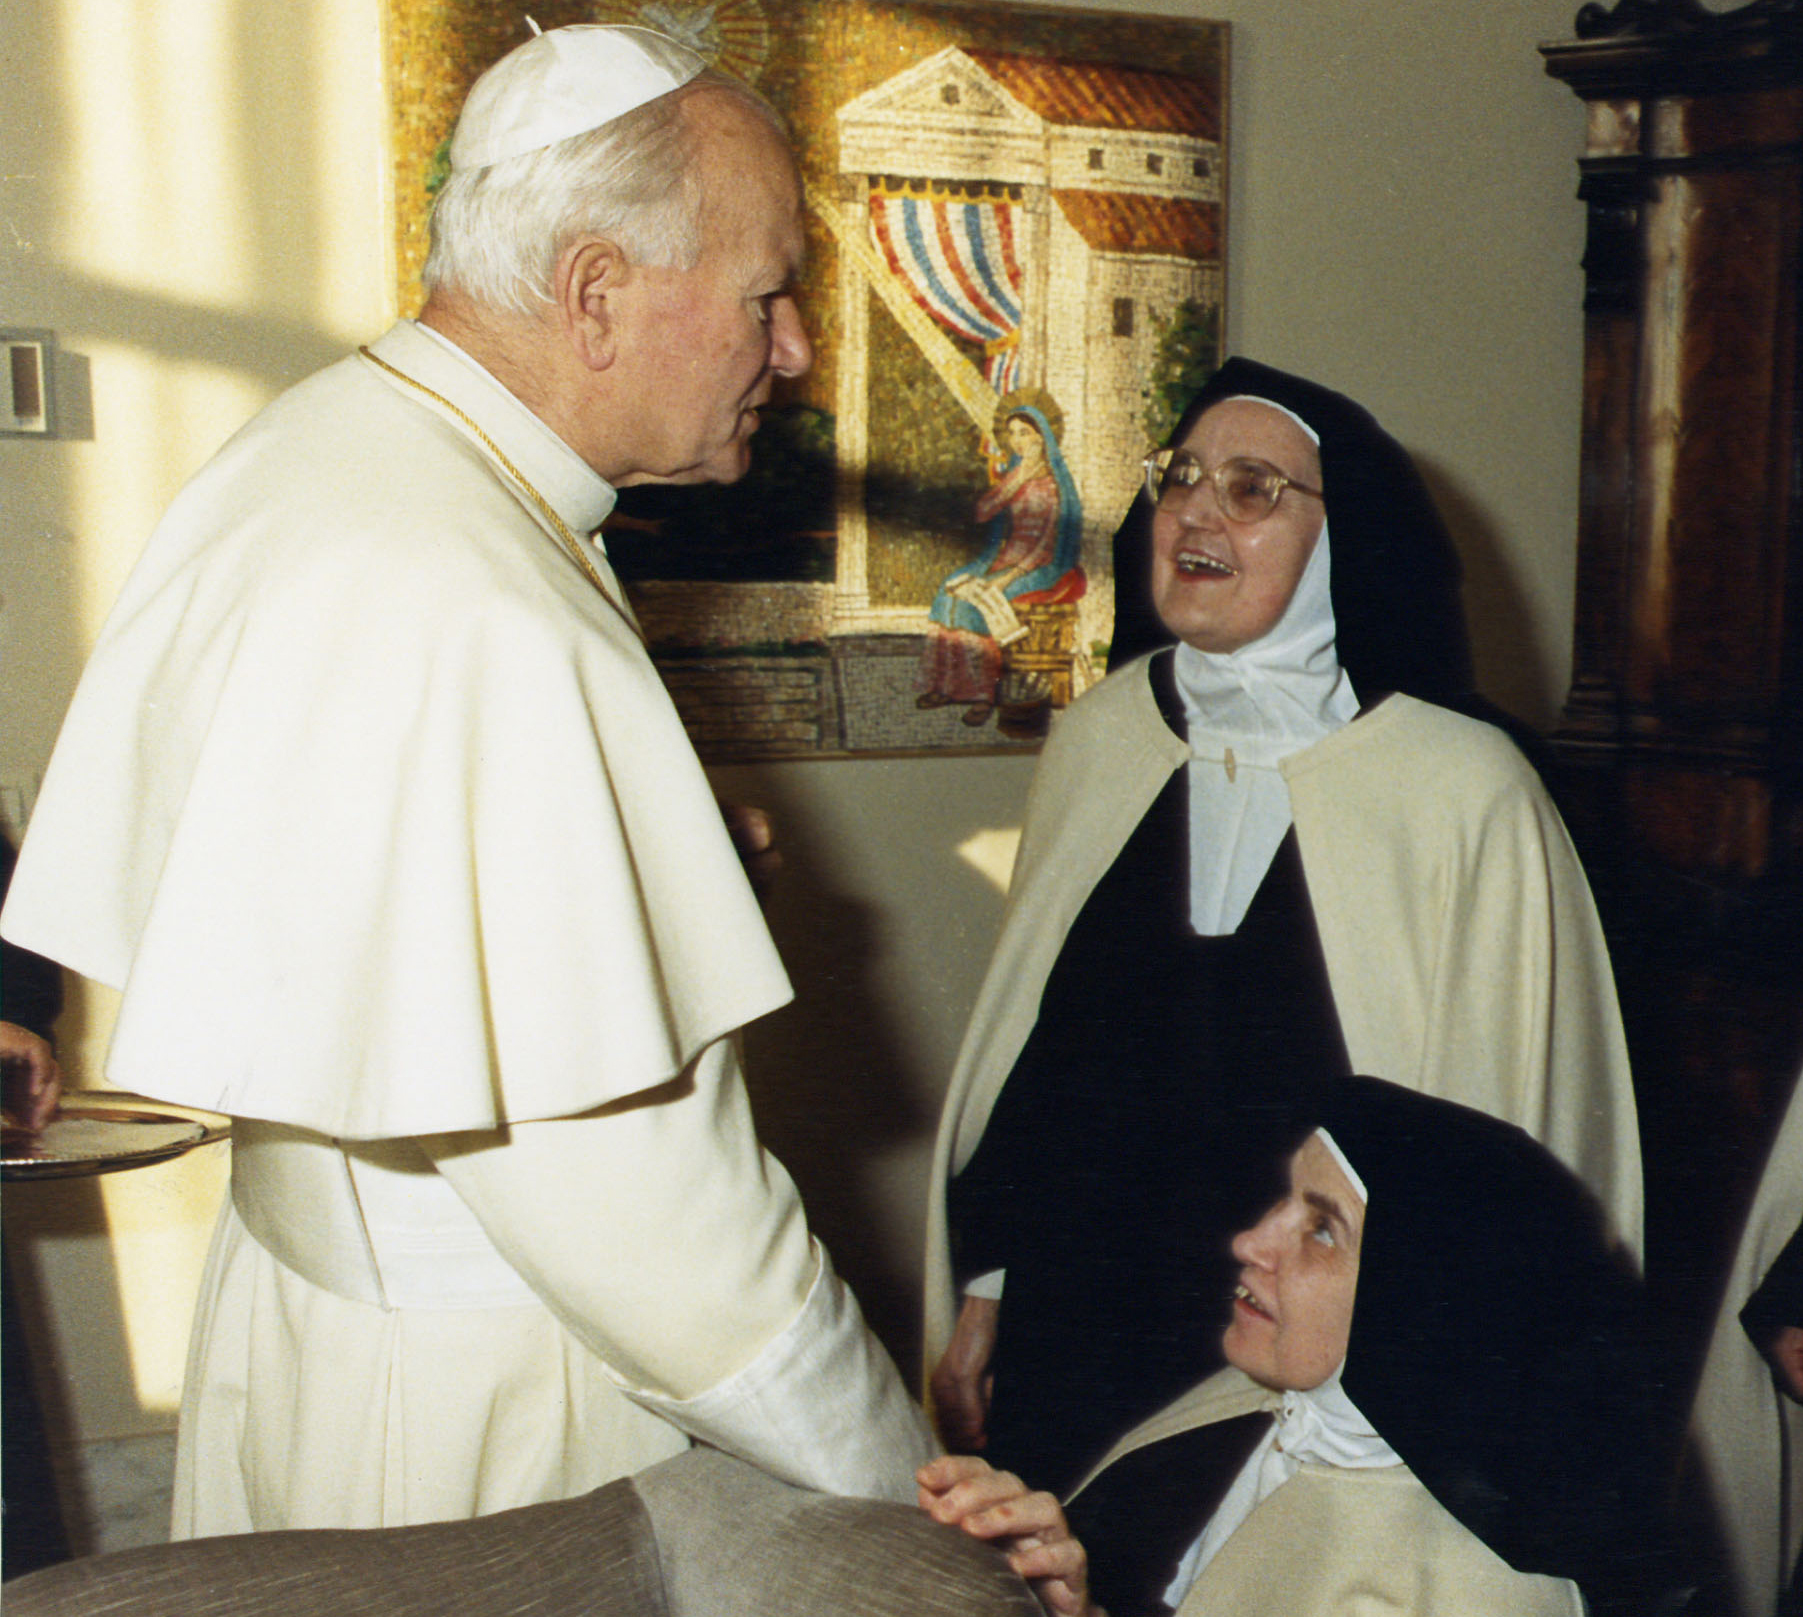 Audiencia privada con S.S. Juan Pablo II